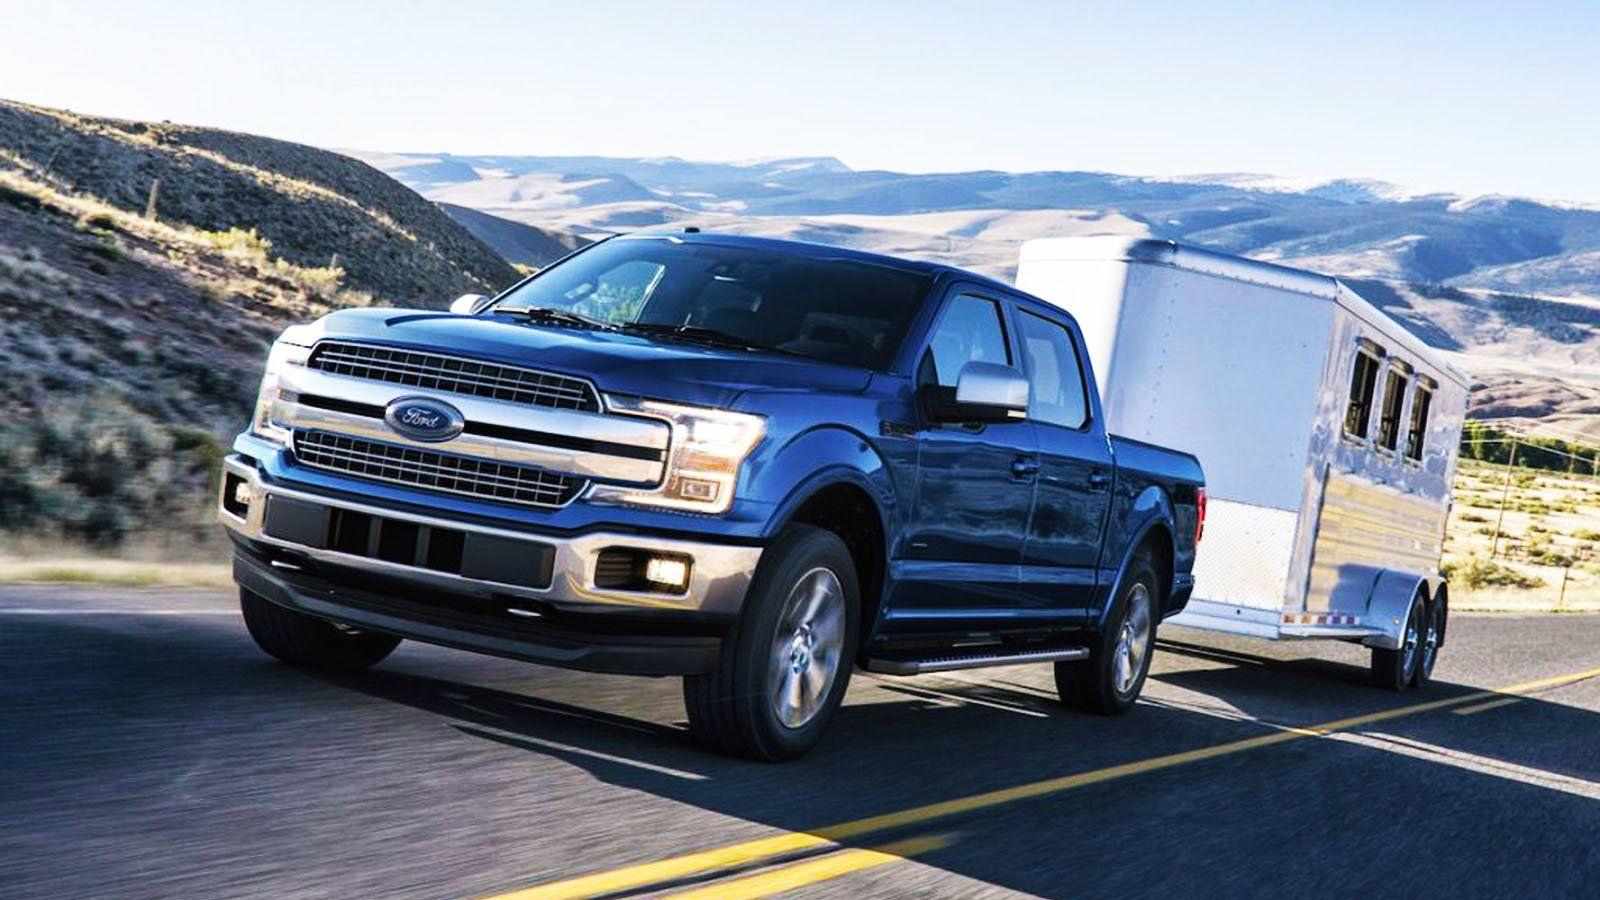 Ford Trucks Ford F150 Truck Comparison